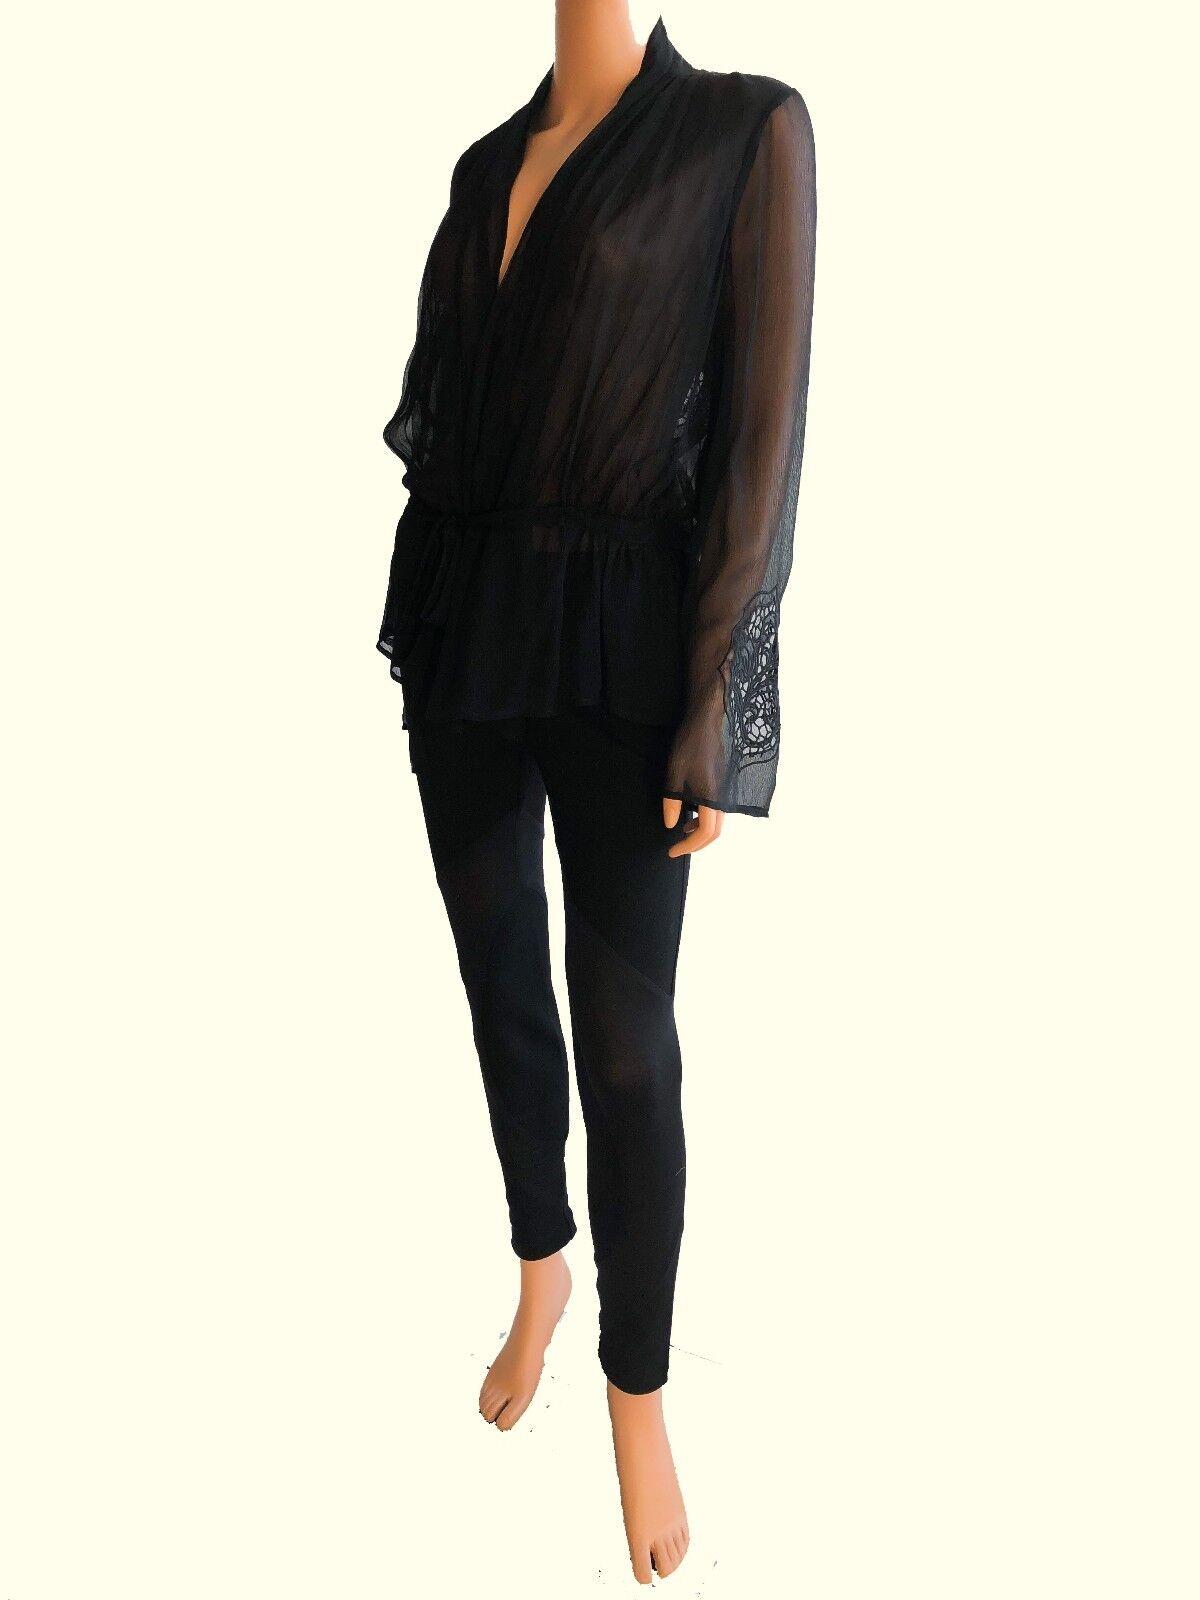 Haute Hippie Long Sleeve schwarz Silk  Blouse With a Belt Größe S